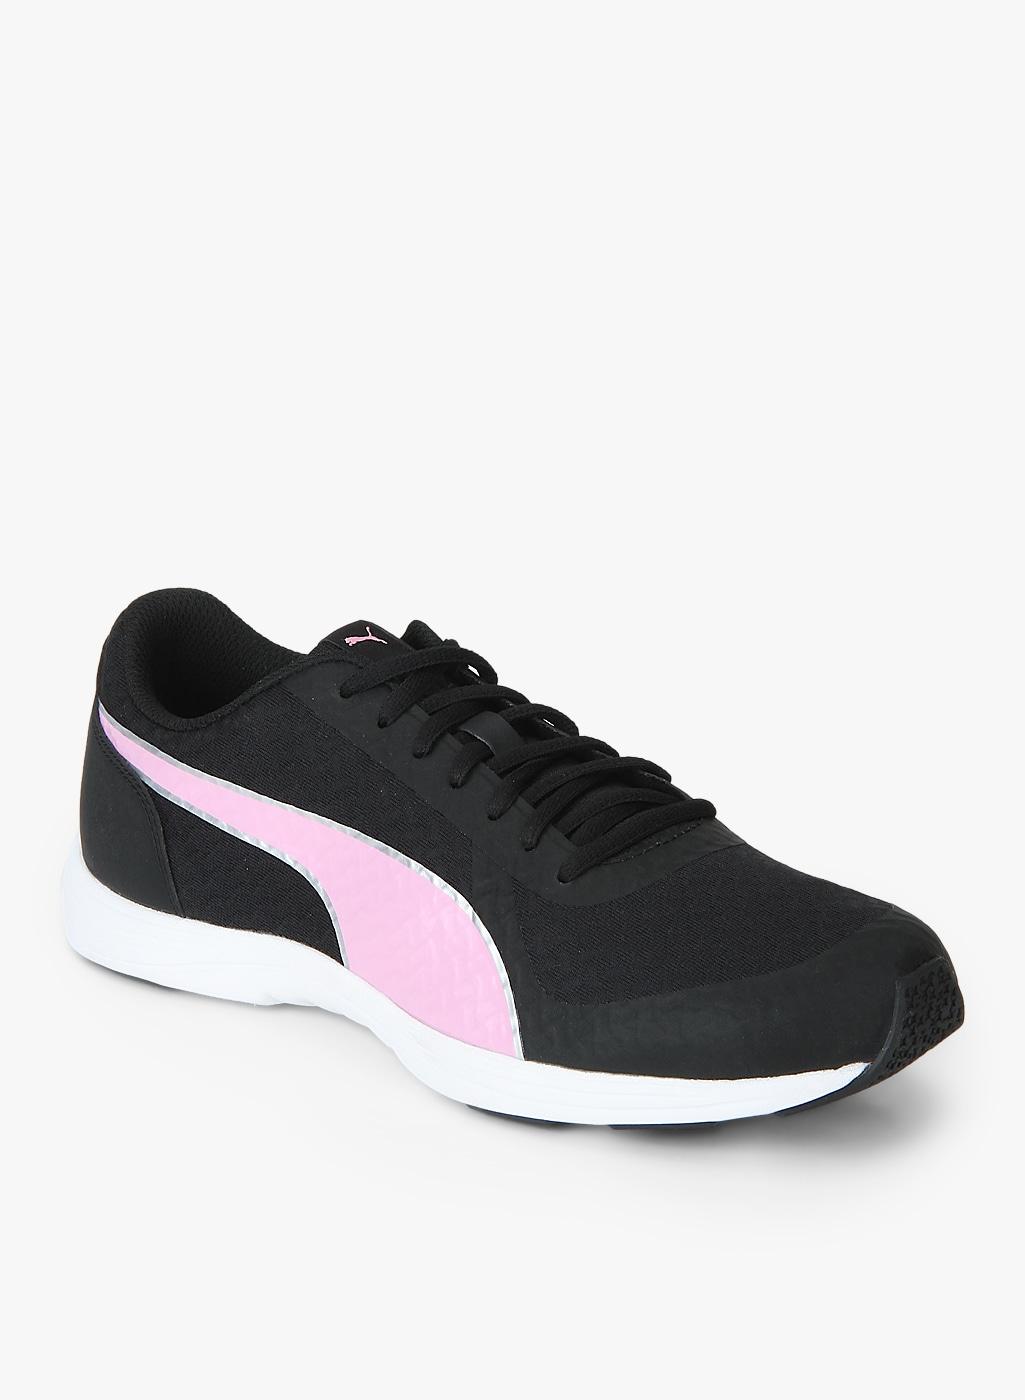 5a8e5165b23c Footwear - Shop for Men